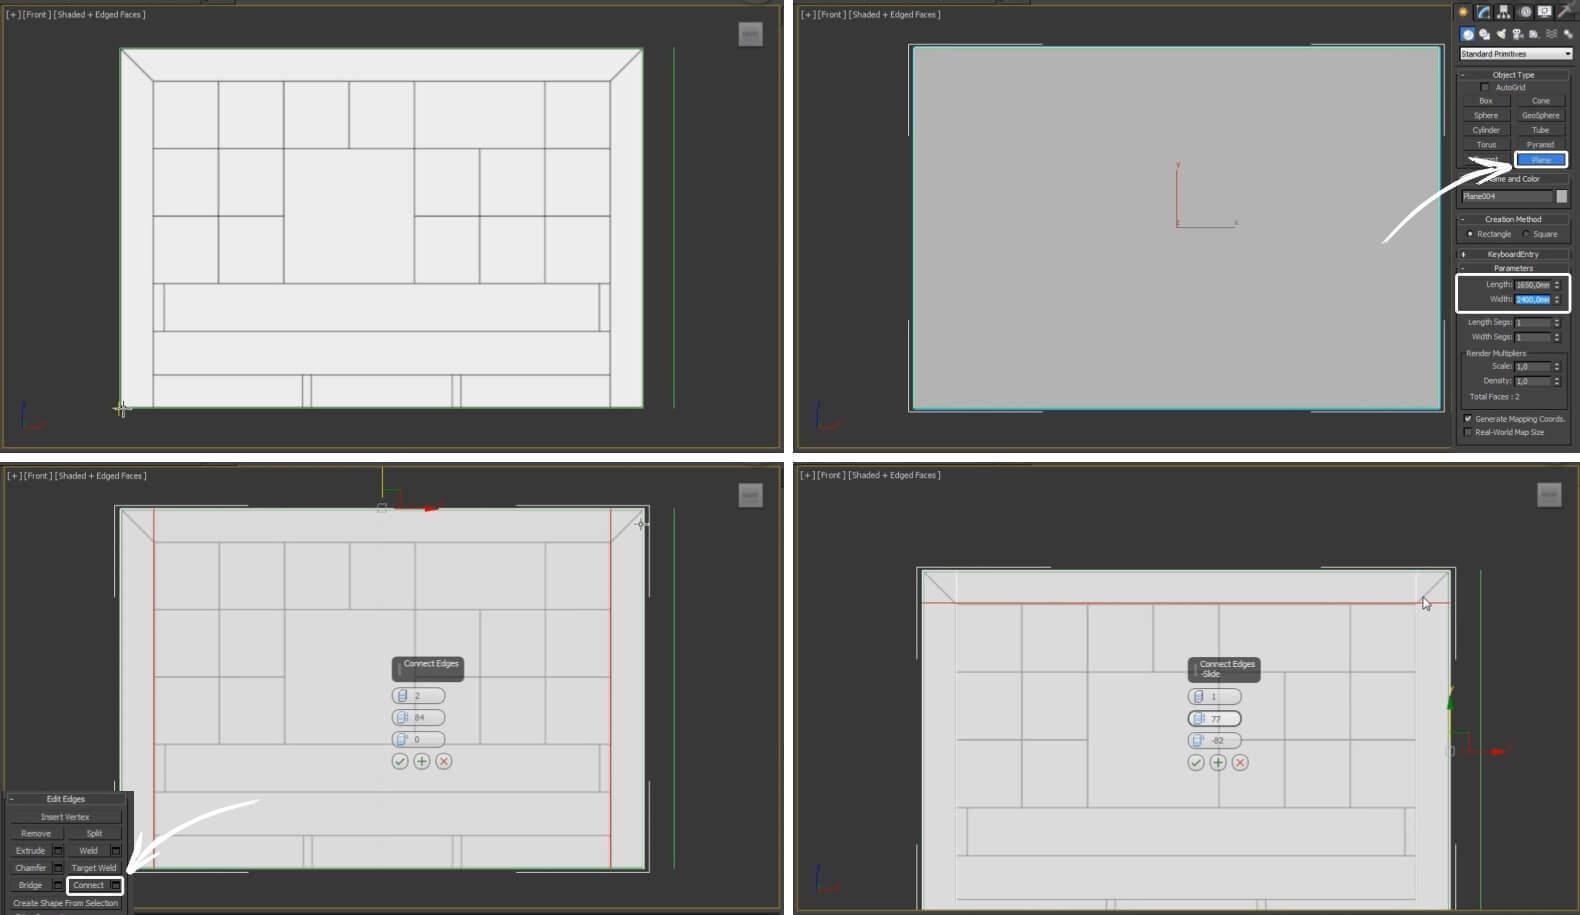 3d моделирование кровати Epoque Cambridge в 3ds Max и в Marvelous Designer